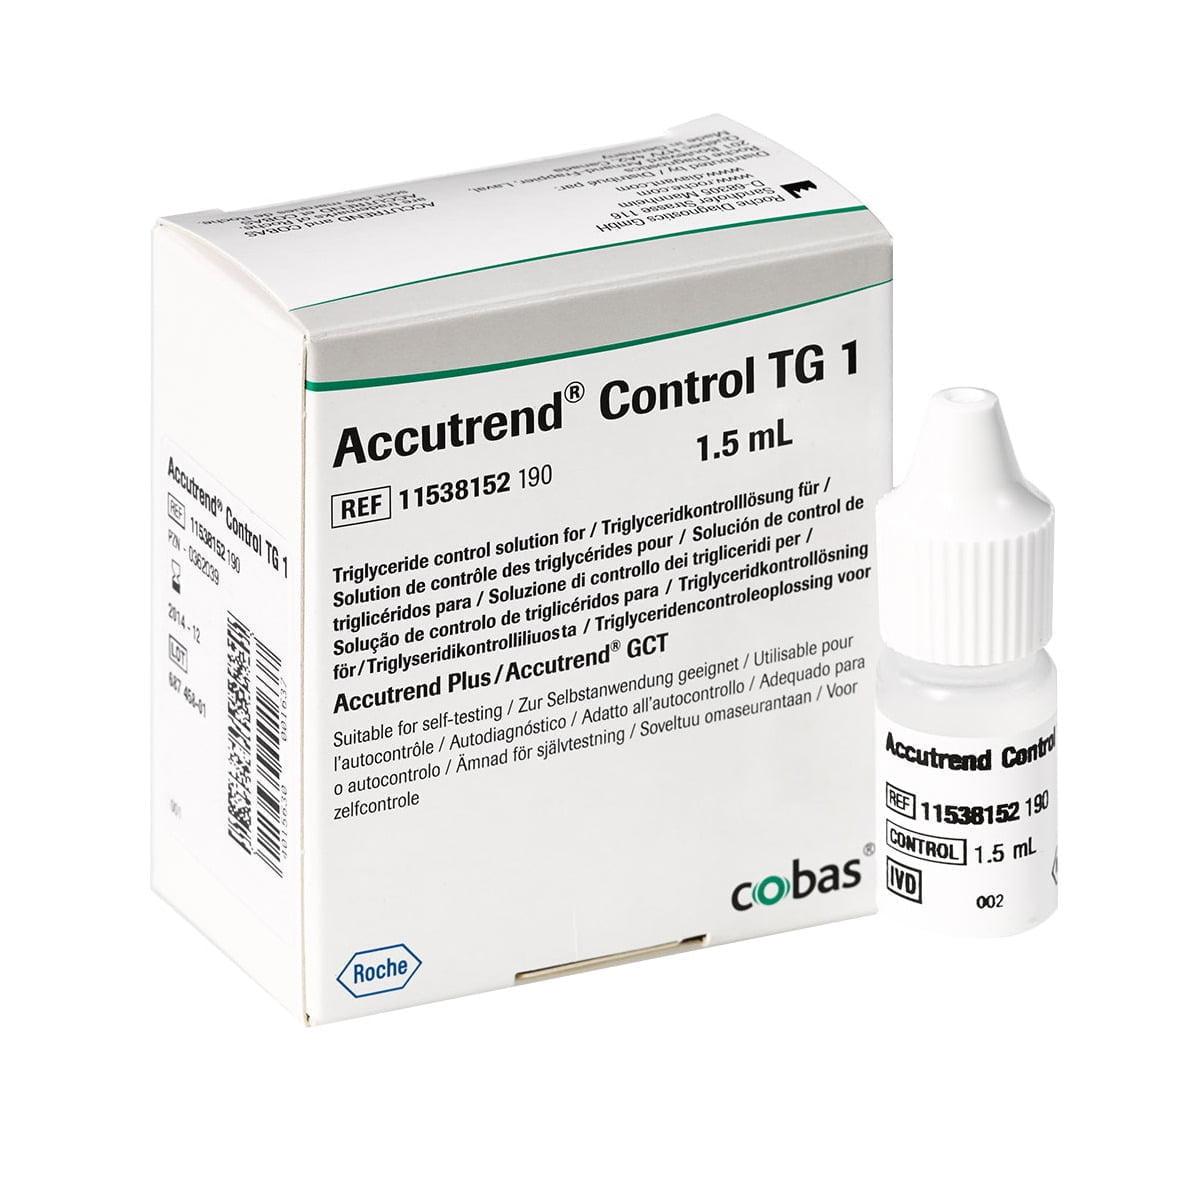 Accutrend Control TG 1 (1,5 ml)